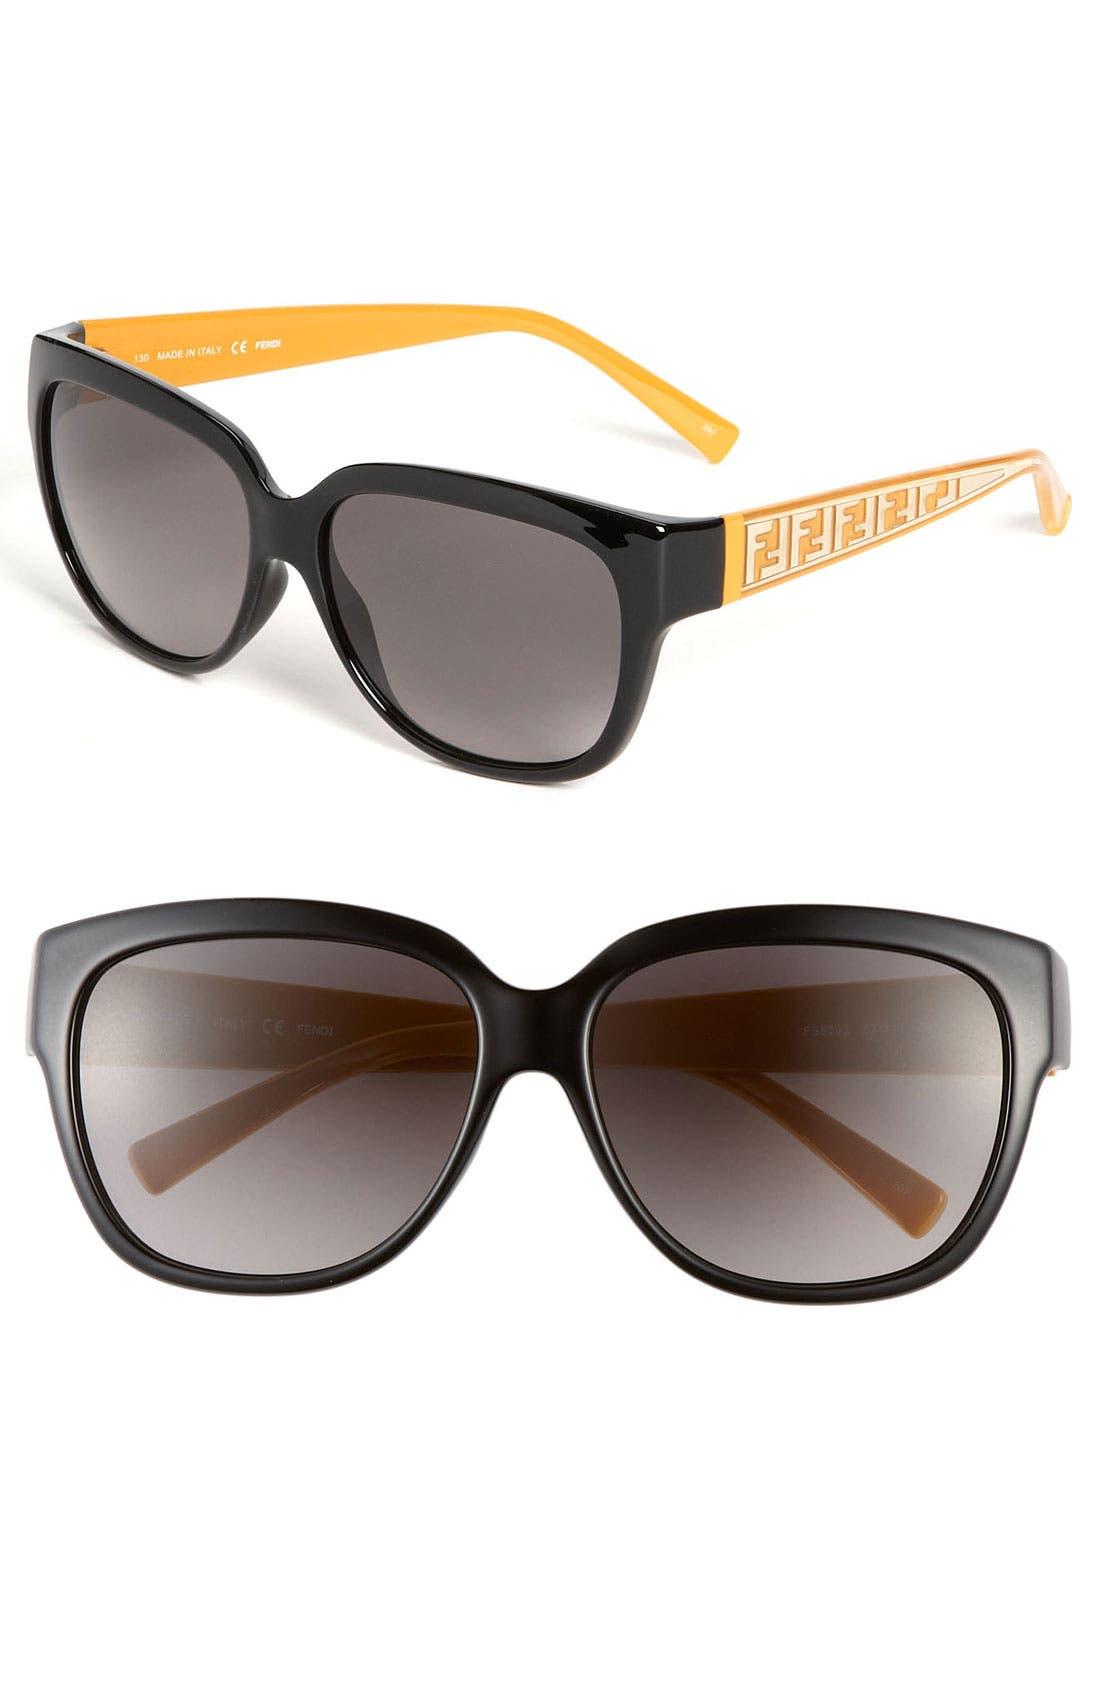 Alternate Image 1 Selected - Fendi 'Zucca' 57mm Sunglasses